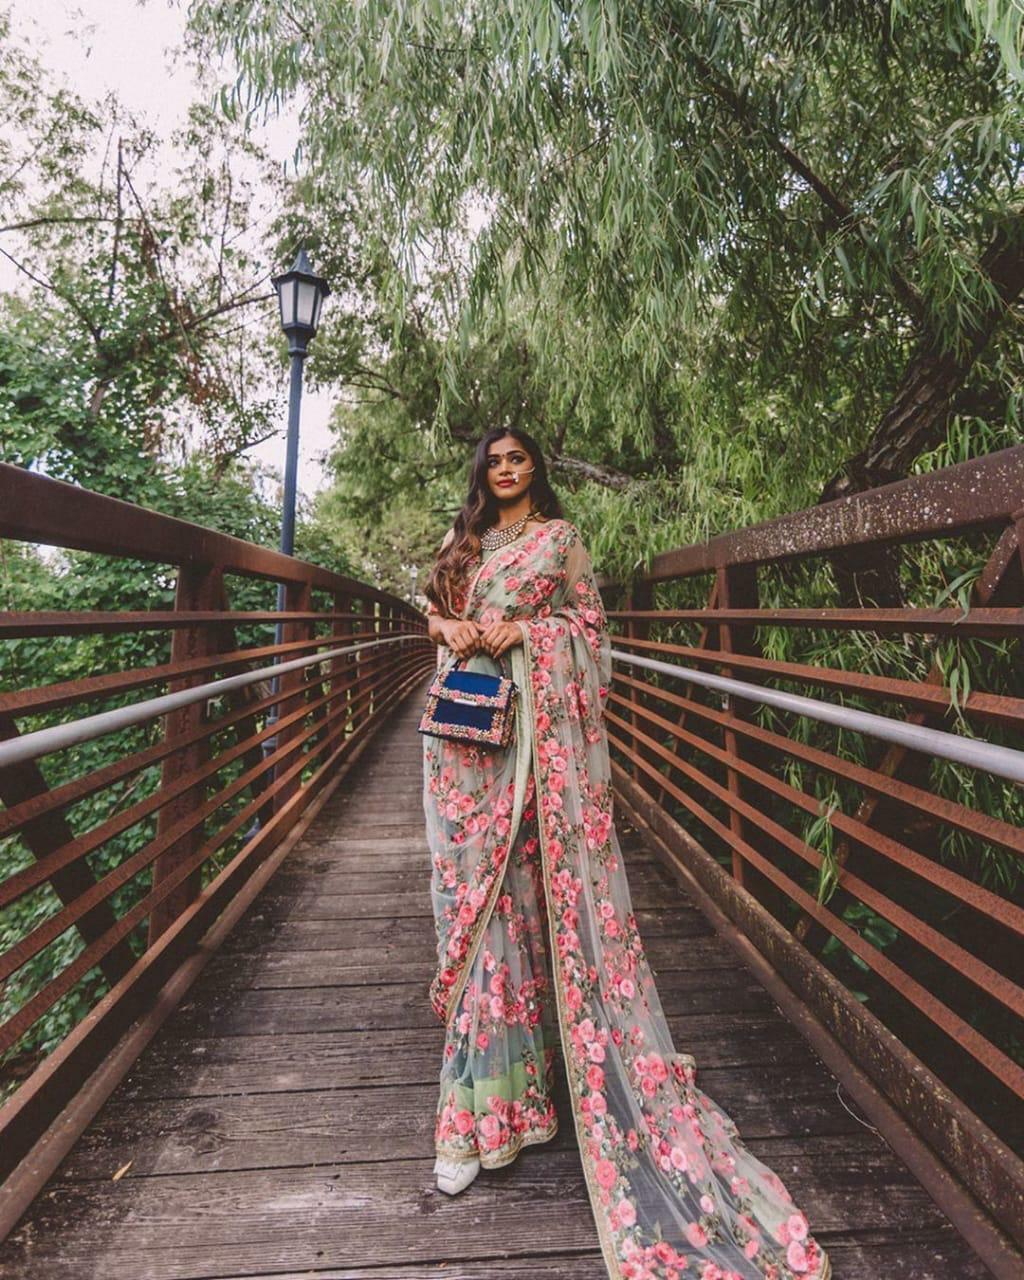 Floral Thread Green Sari Saree Indian Ethnic Wedding Party Wear Designer Lengha